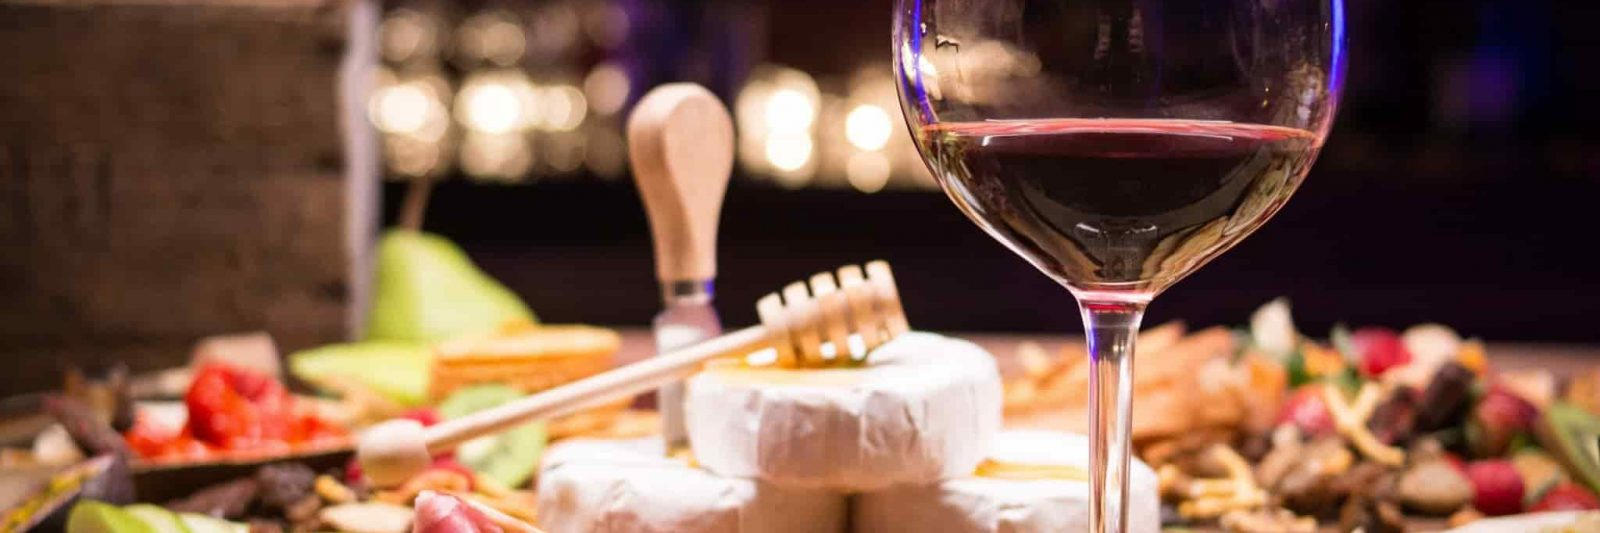 best restaurants in montpellier france